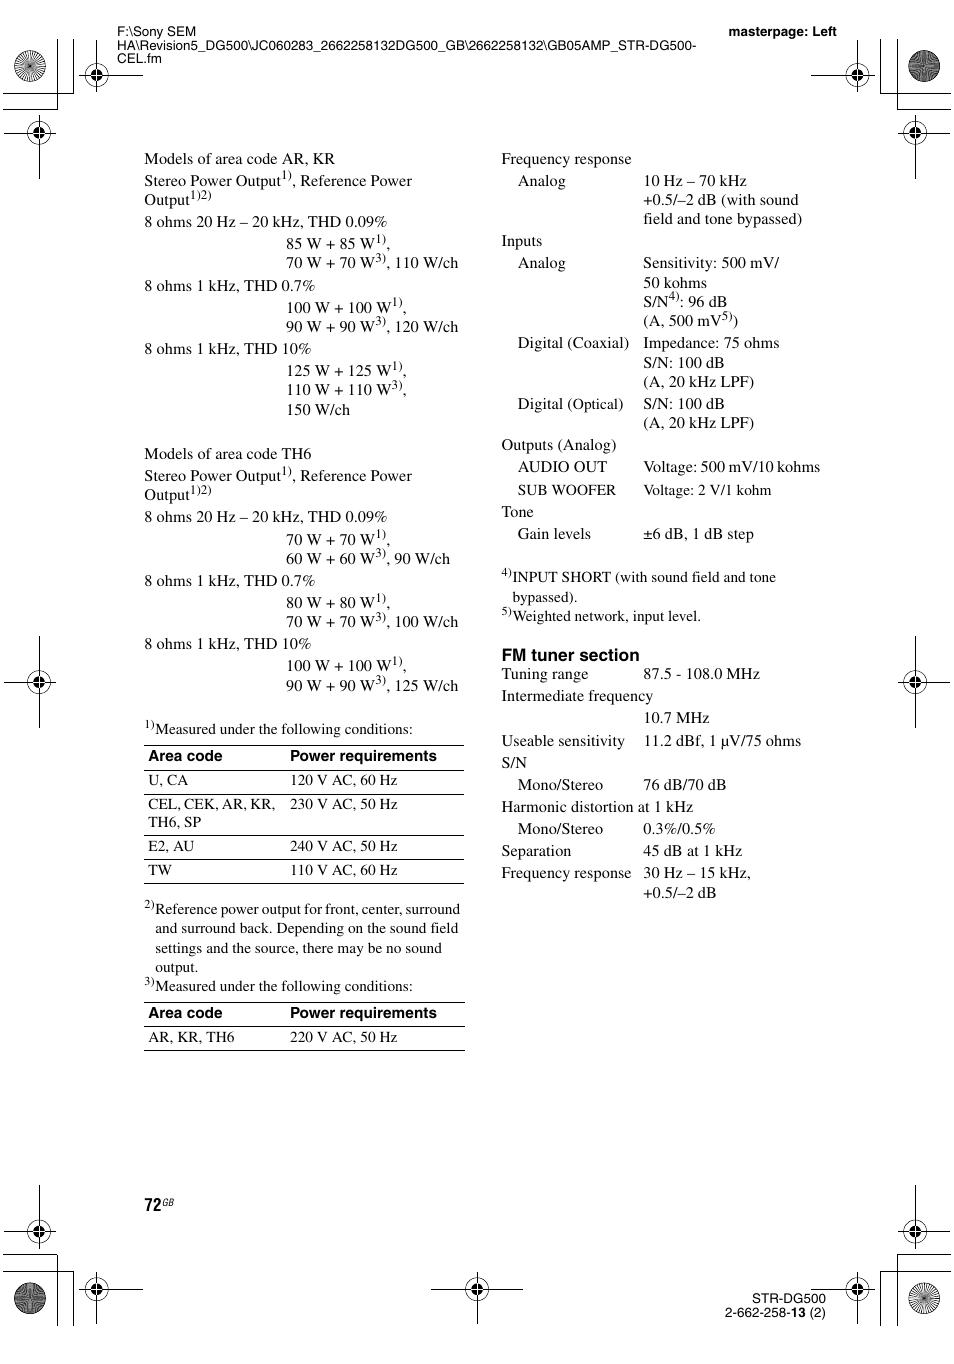 Sony STR-DG500 User Manual   Page 72 / 76   Original mode